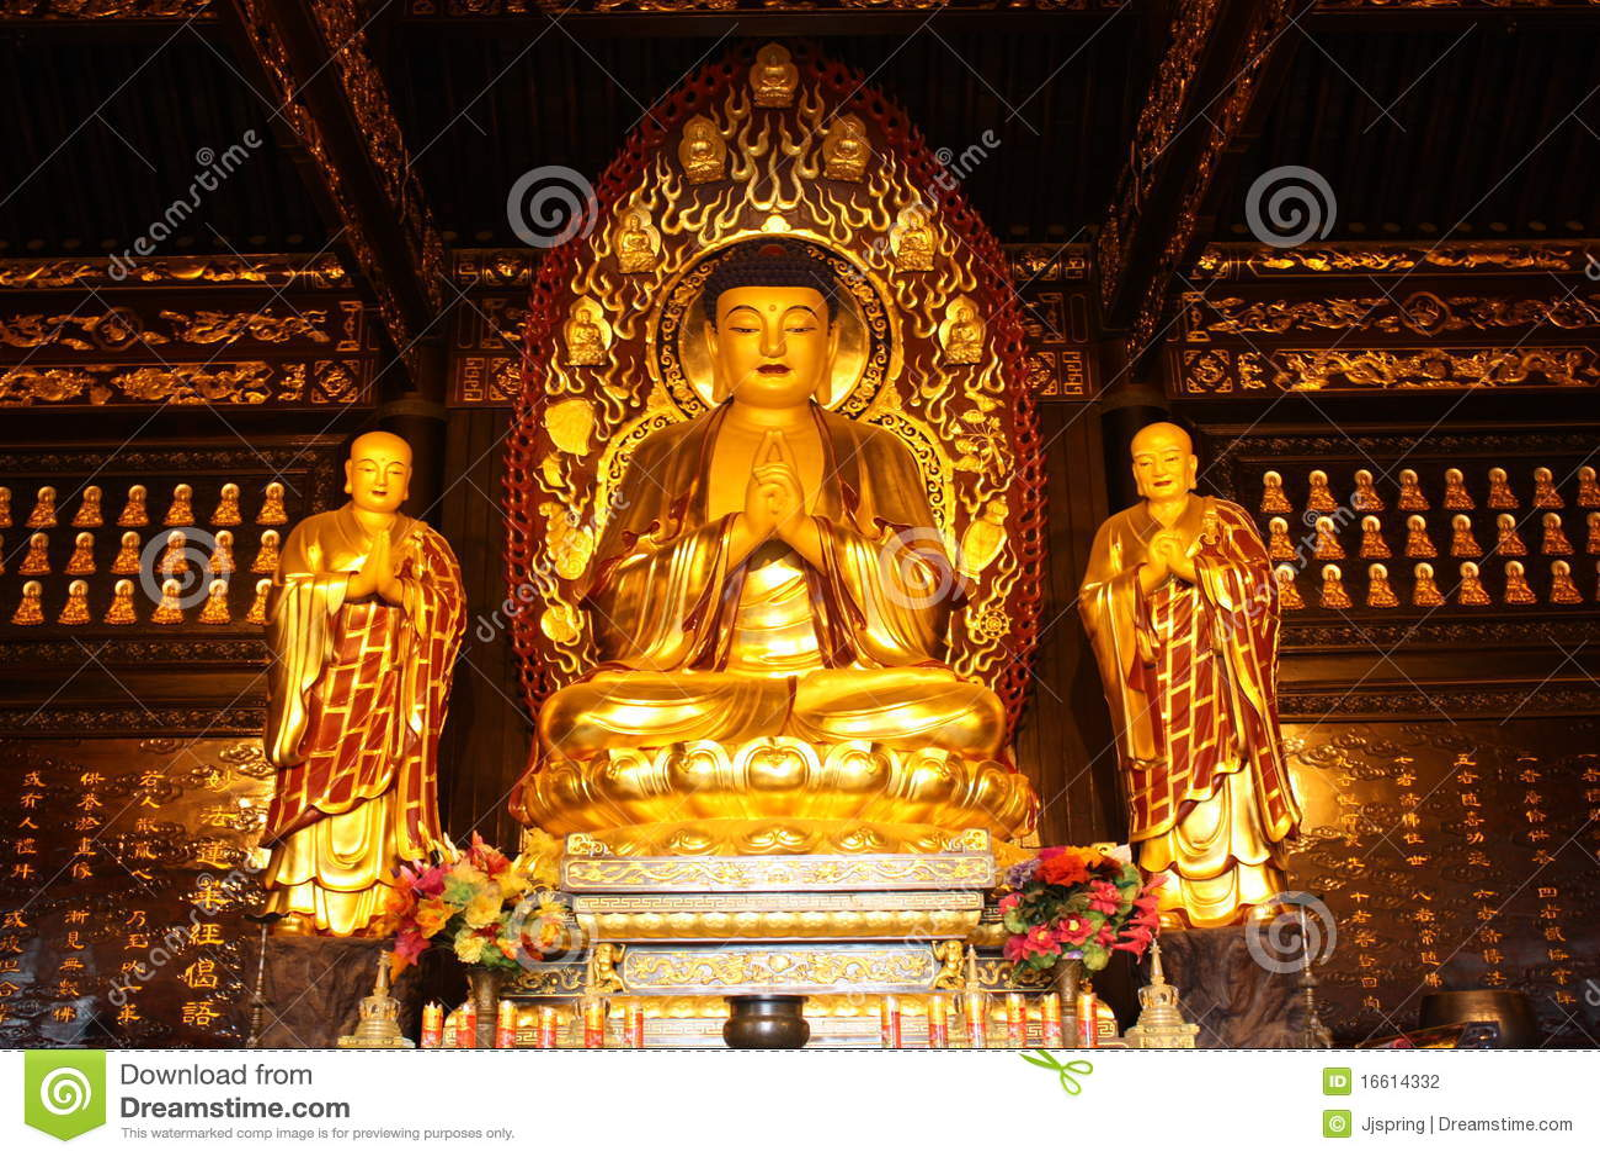 temple bouddhiste statue d 39 or de bouddha photo stock image du asie forme 16614332. Black Bedroom Furniture Sets. Home Design Ideas